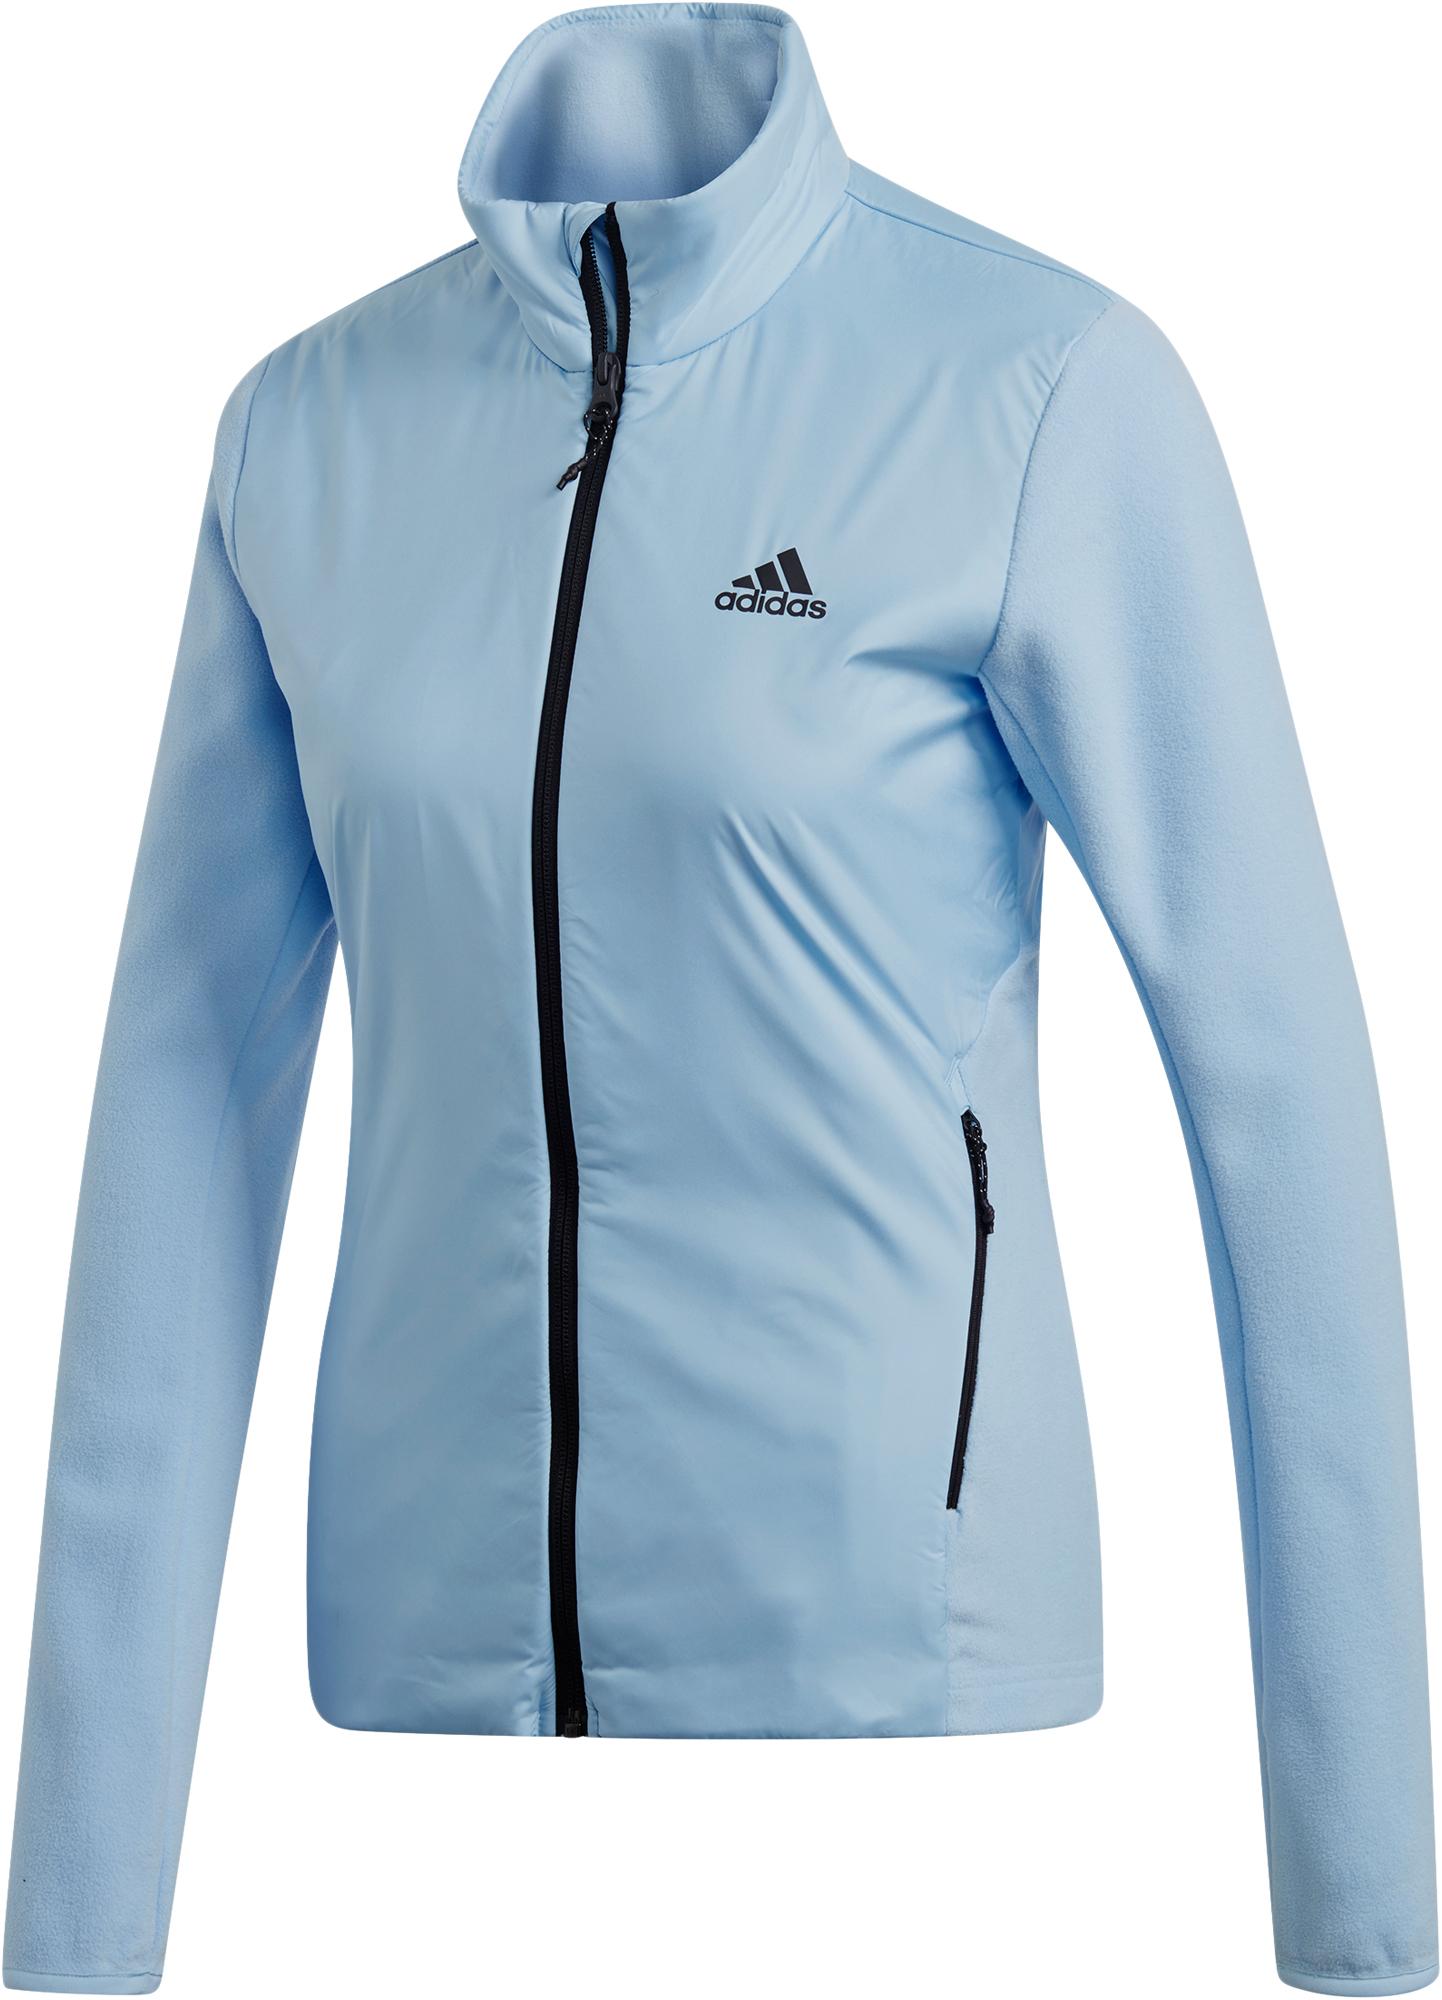 Adidas Олимпийка женская Windfleece, размер 50-52